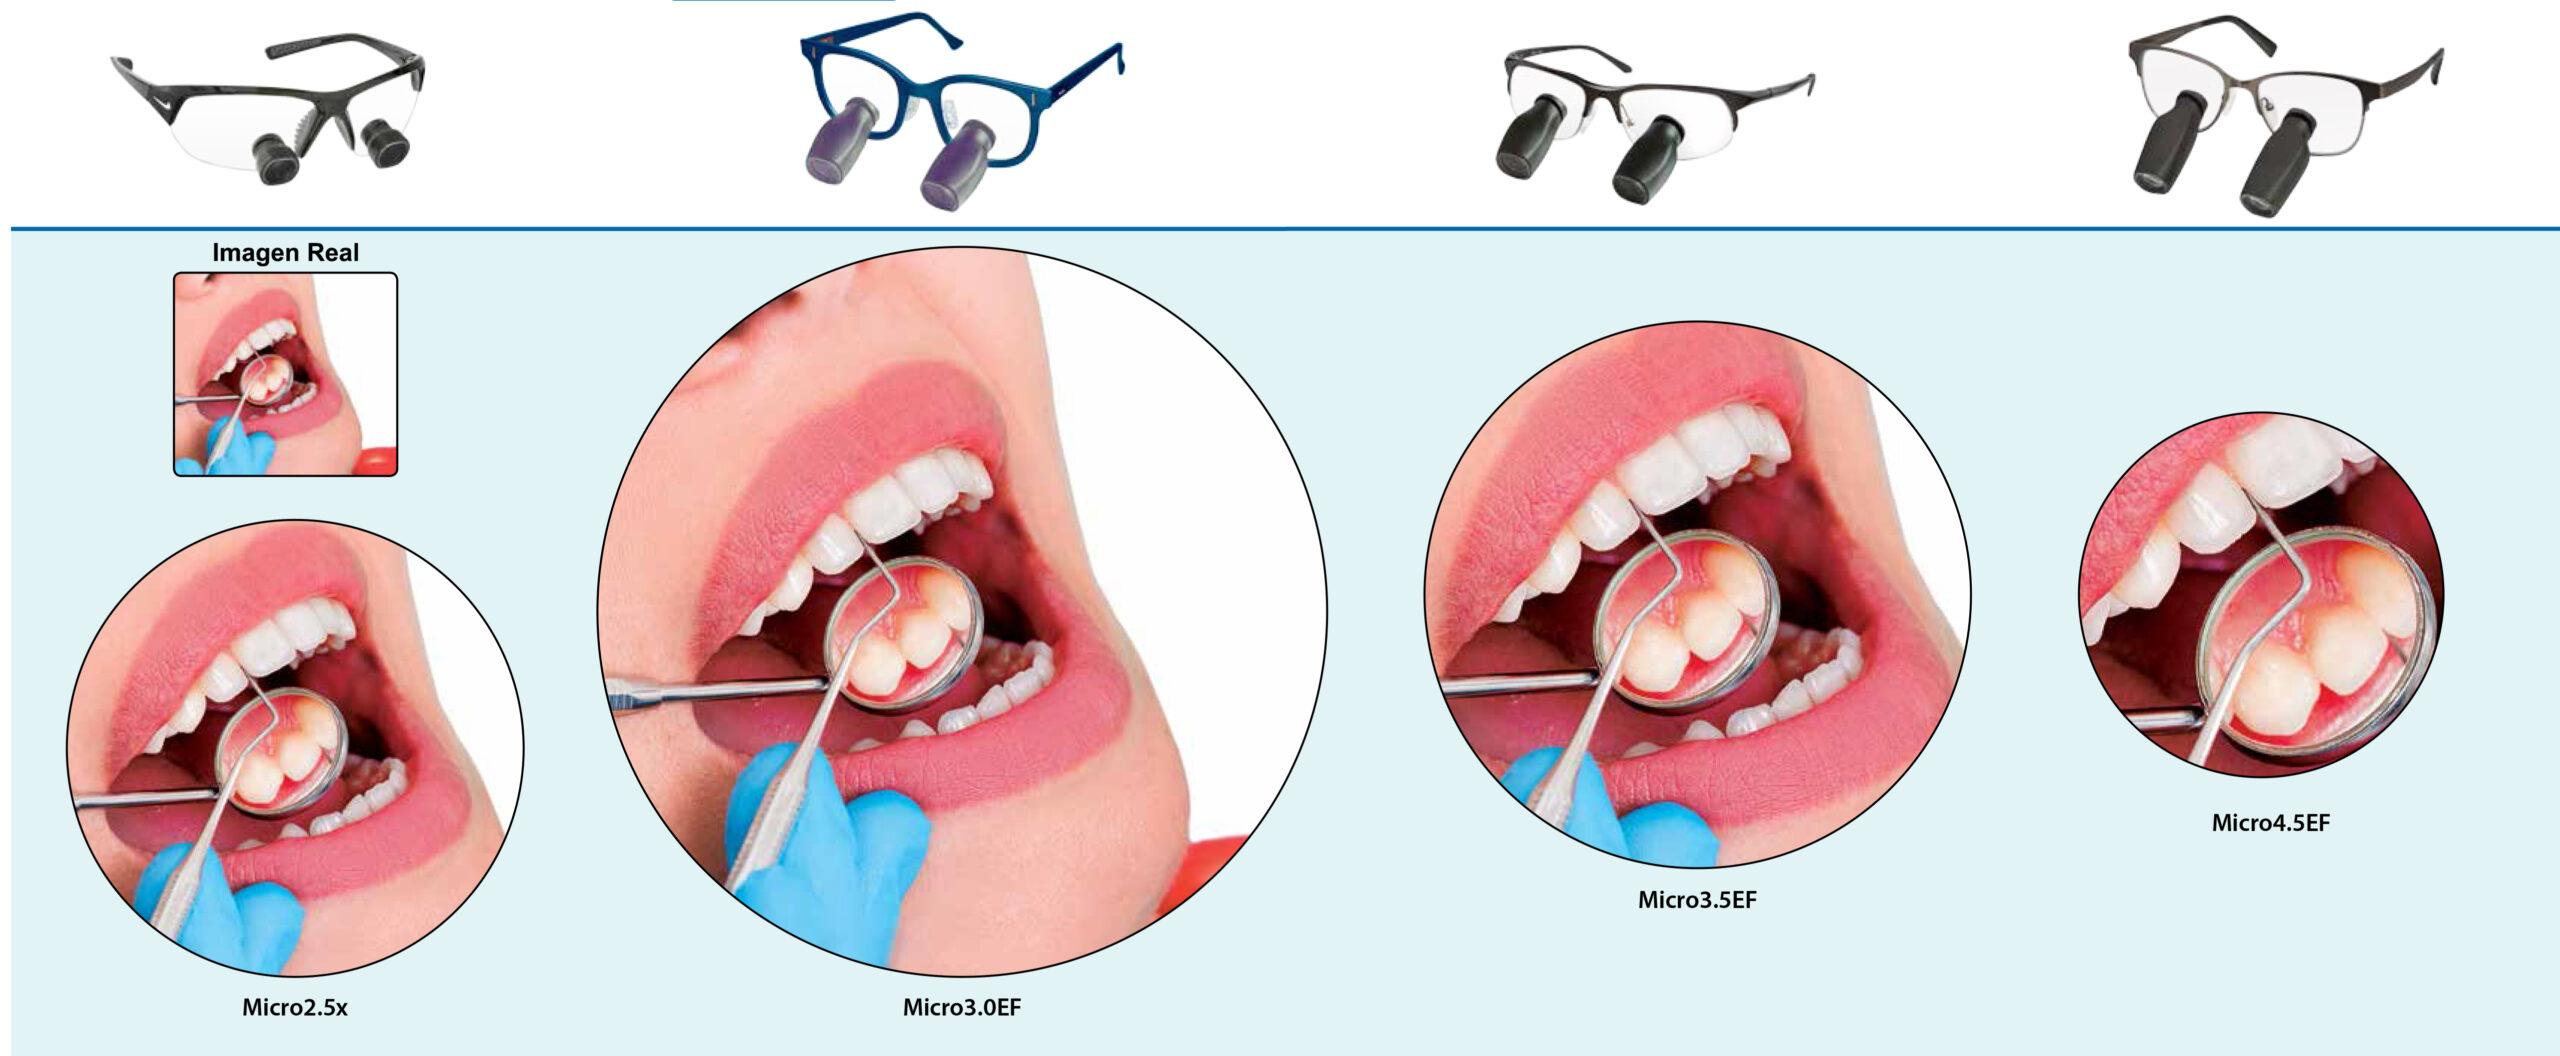 Odontologia_SerieMicro_DFV_AVS